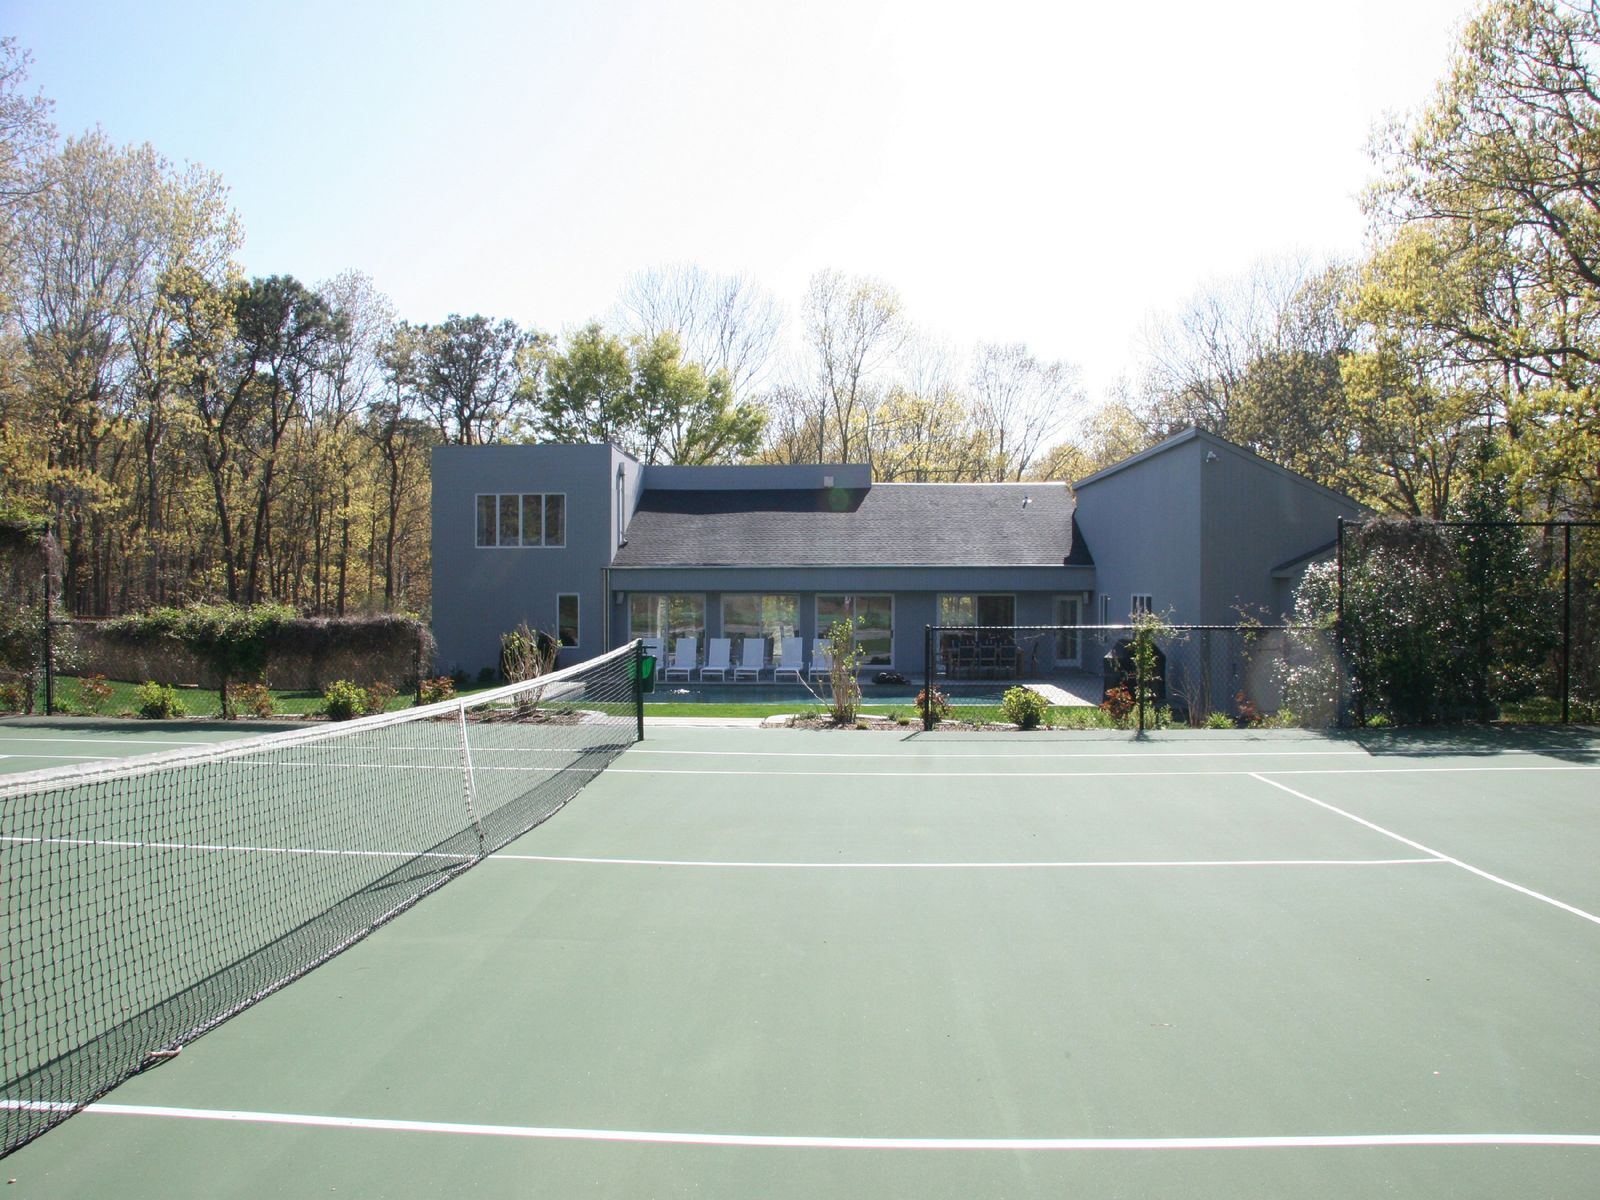 Sag Harbor Spacious Home Pool & Tennis